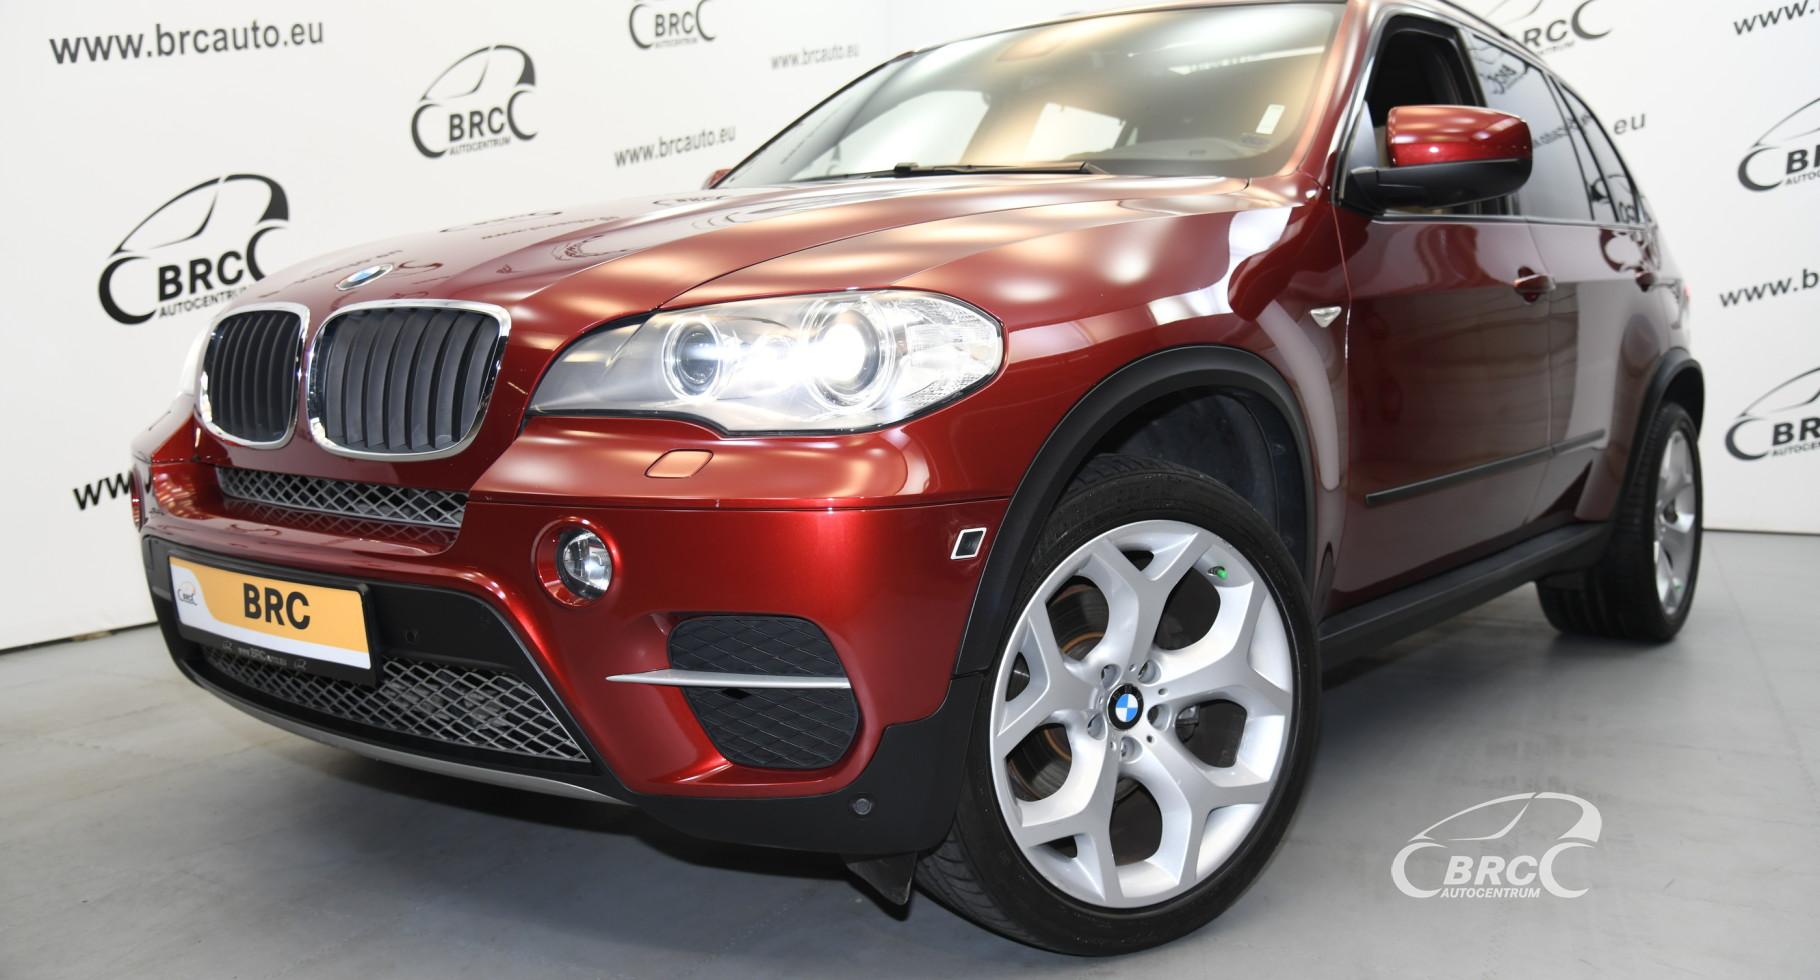 BMW X5 3.0i xDrive Automatas